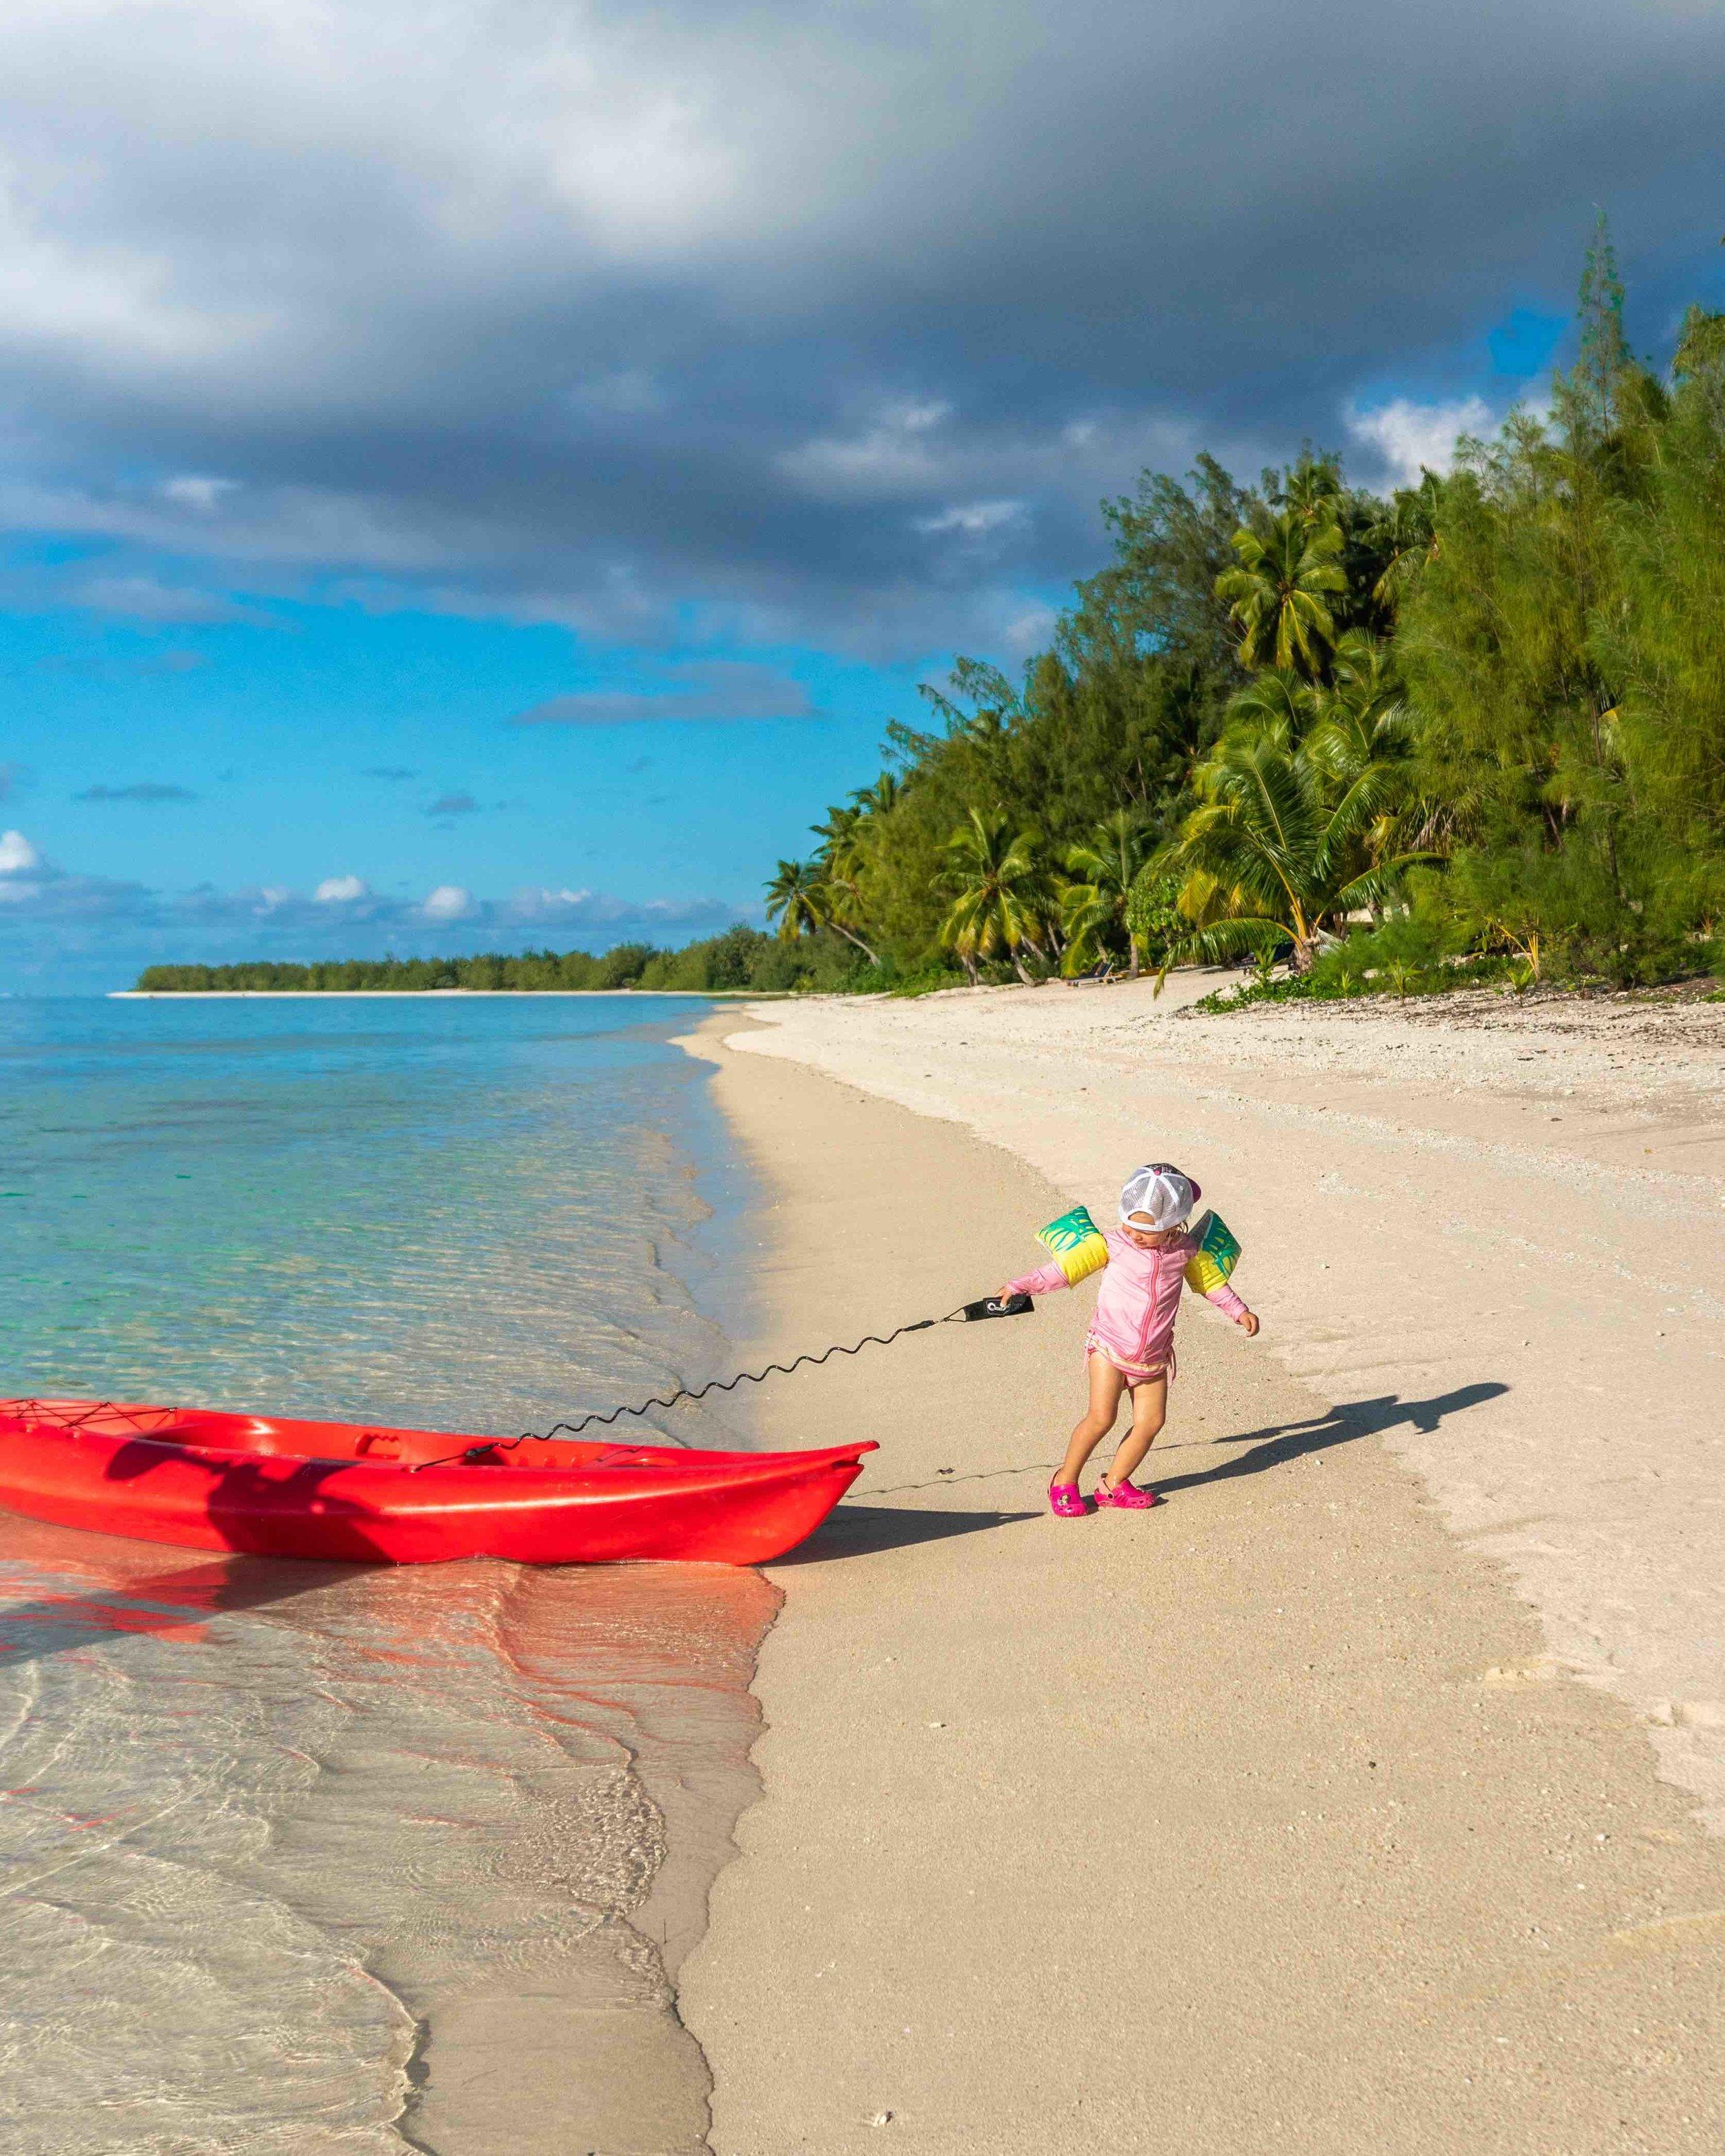 Lifestyle_family_beach_island_kayak_paradise.jpg